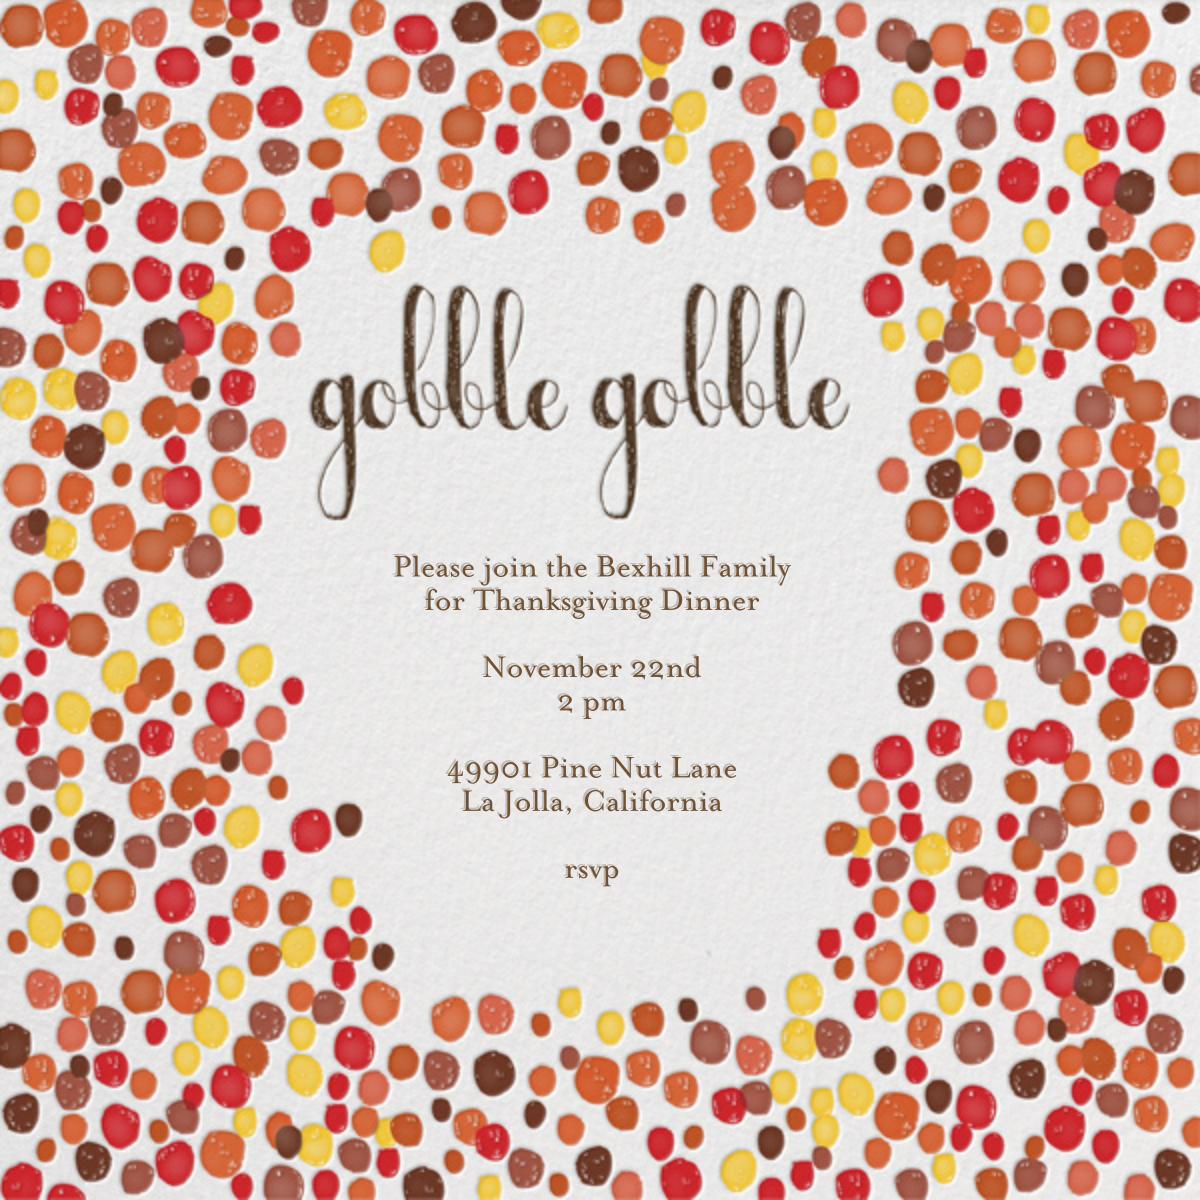 Gobble Gobble - Brights - Mr. Boddington's Studio - Thanksgiving